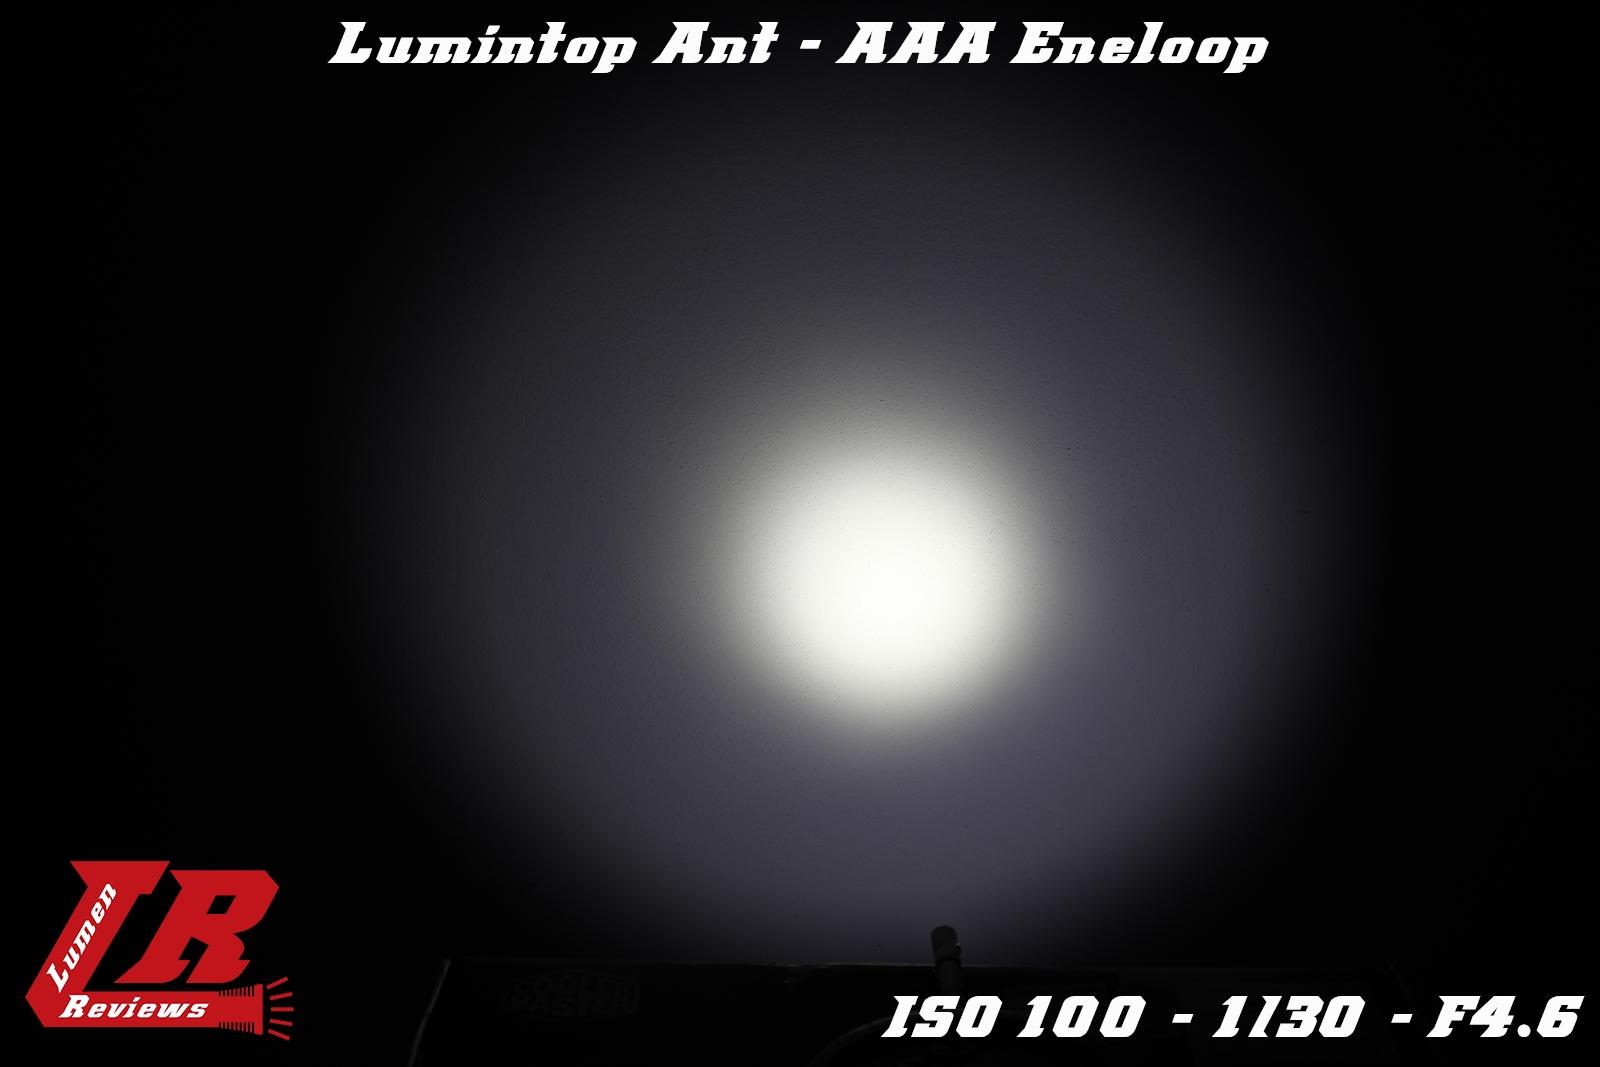 Lumintop Ant 25